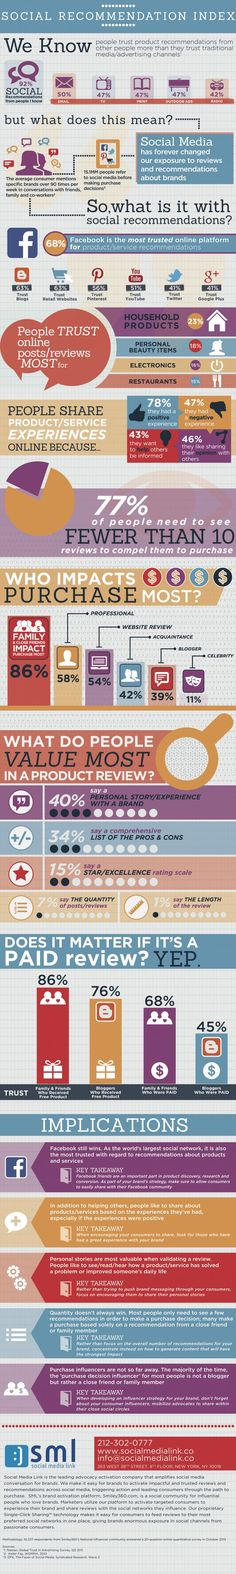 SOCIAL MEDIA -         Social Recommendation Index #infographic #socialmedia